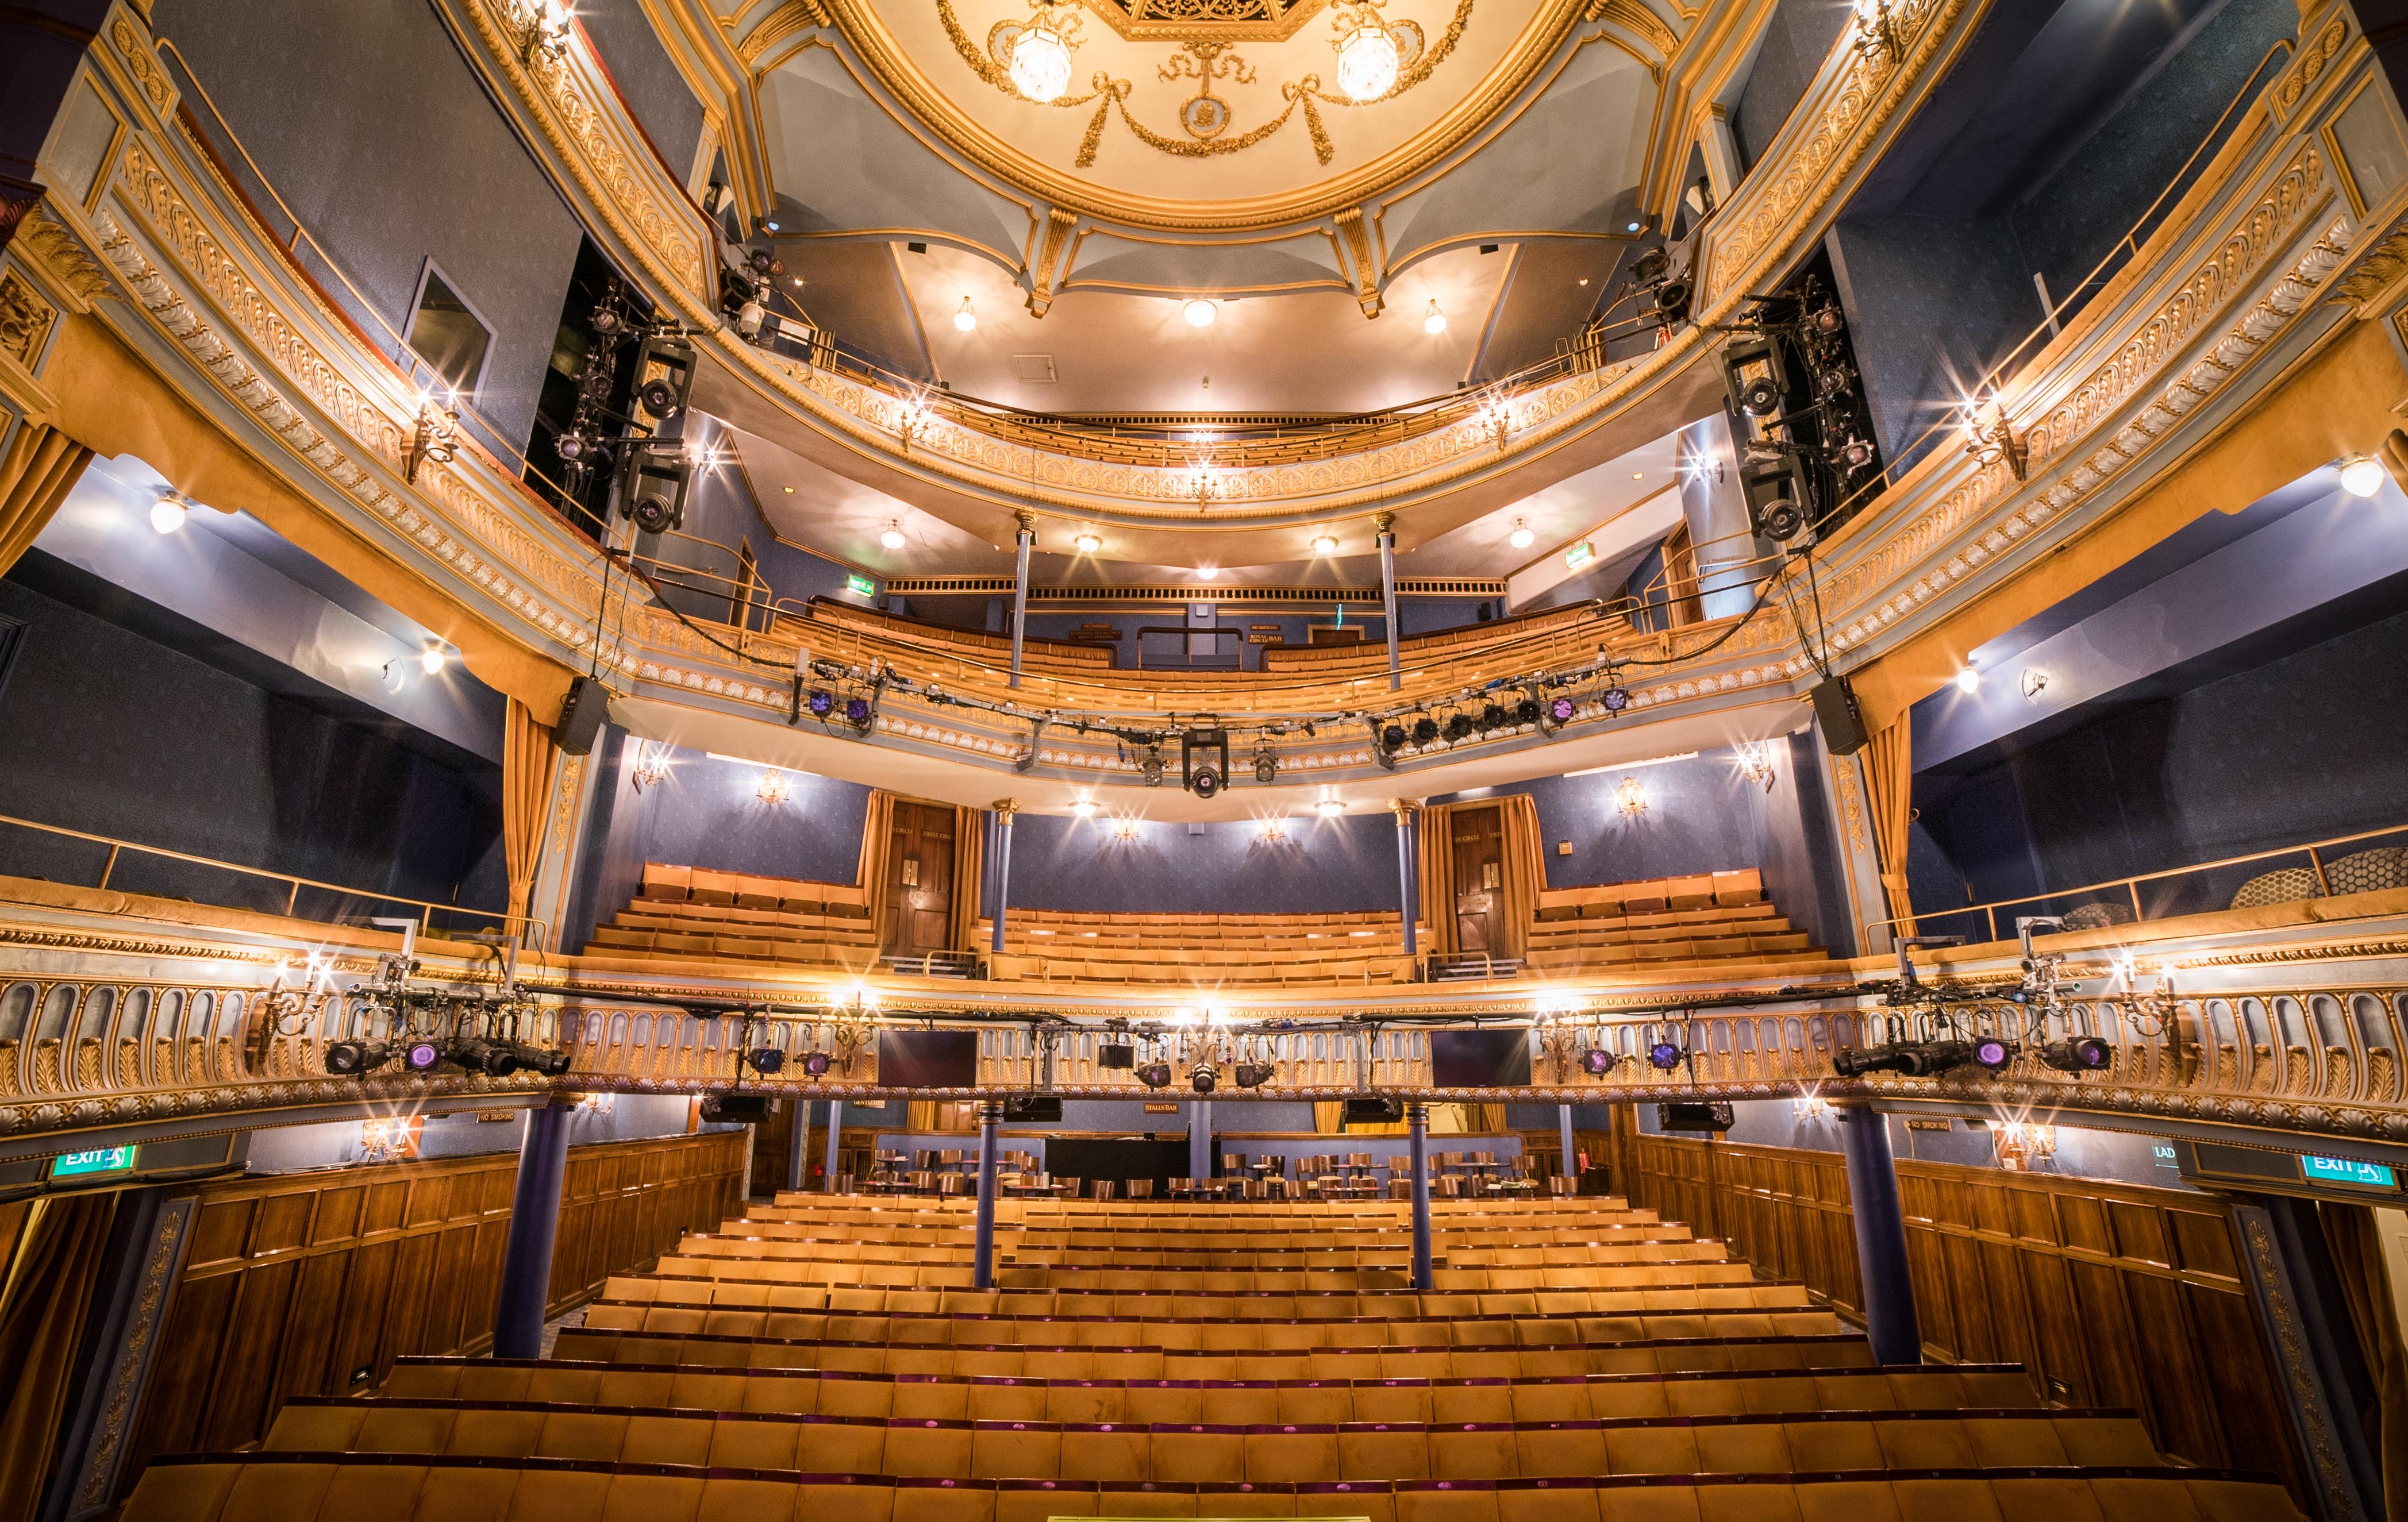 The New Probax Auditorium Seating At The Harold Pinter